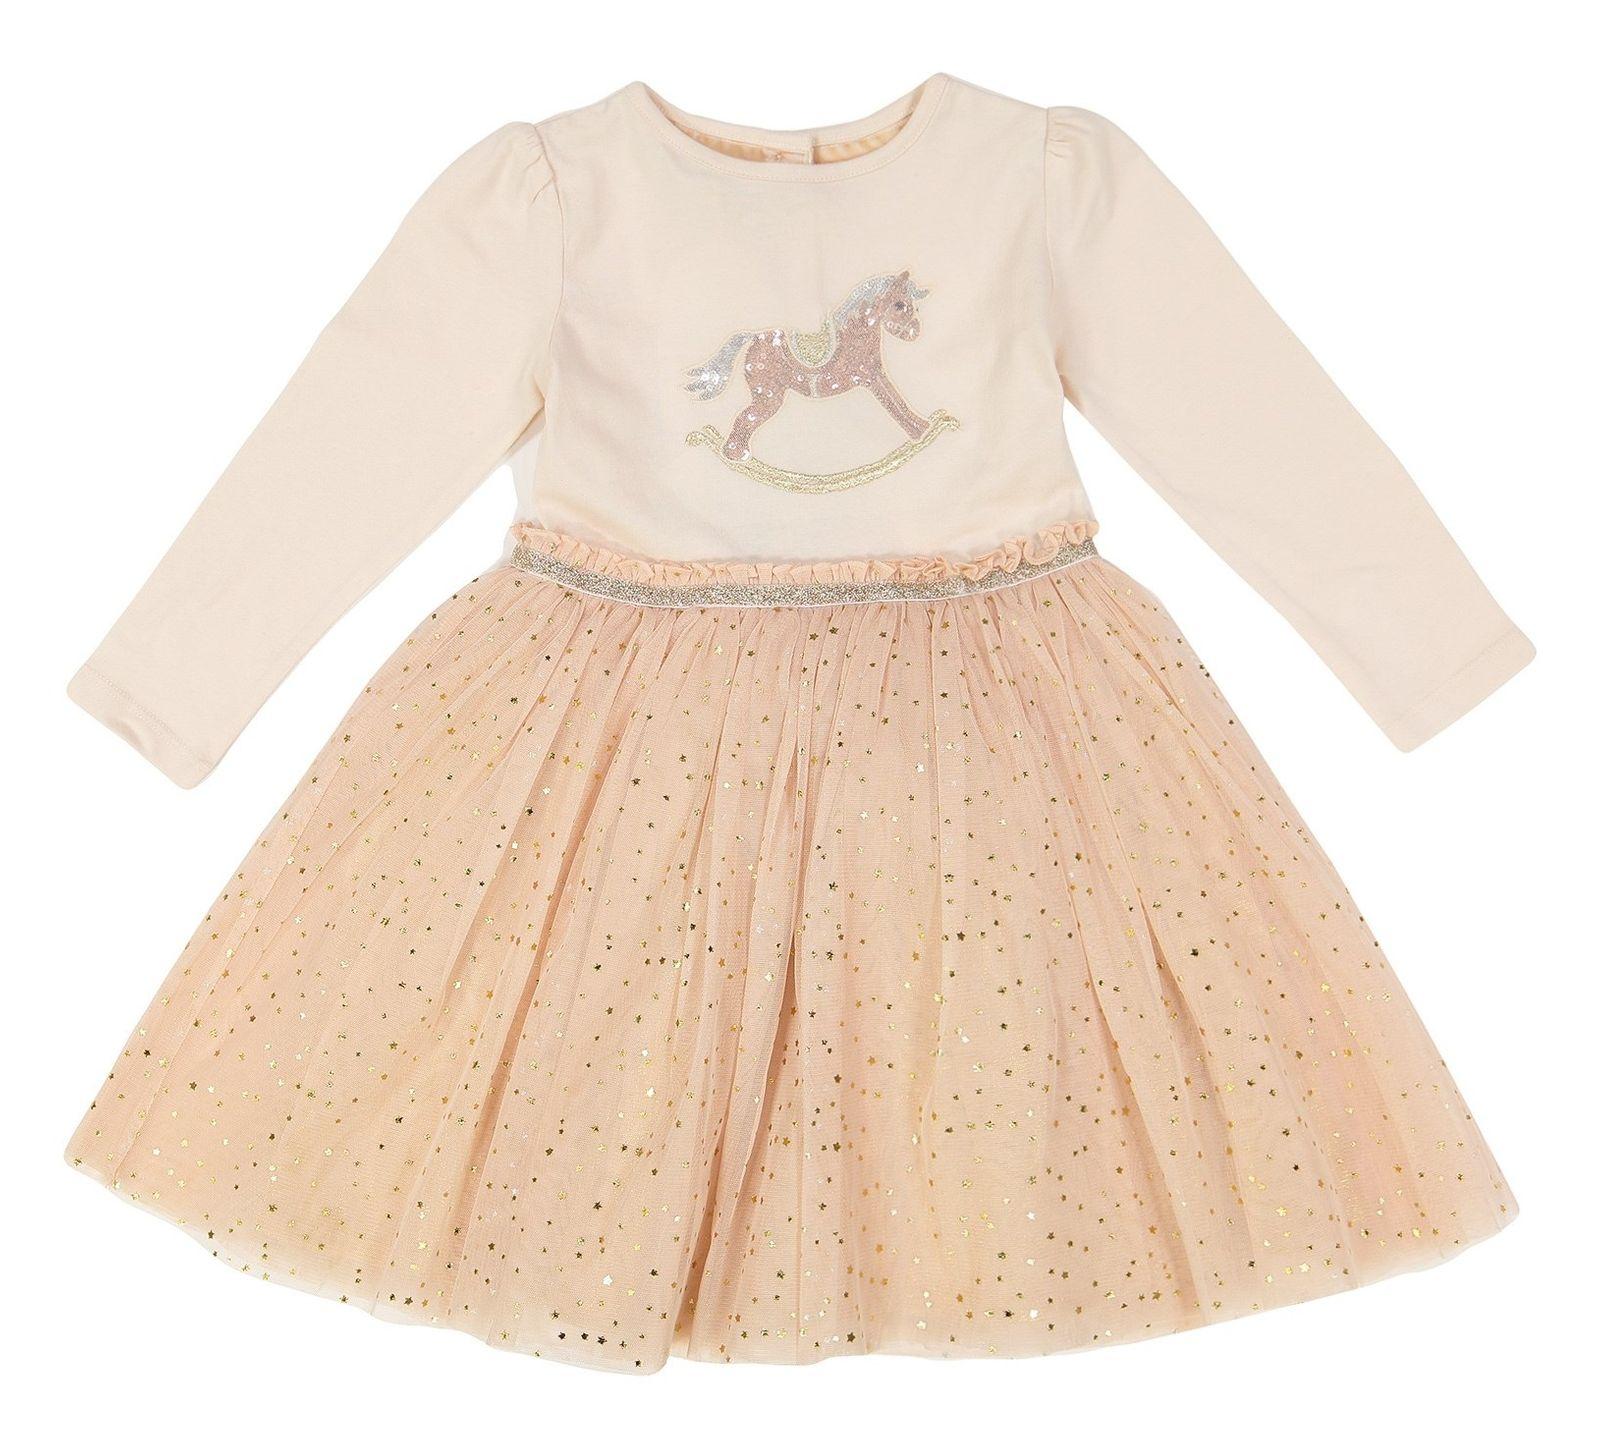 پیراهن نخی نوزادی دخترانه - مانسون چیلدرن - صورتي  - 1